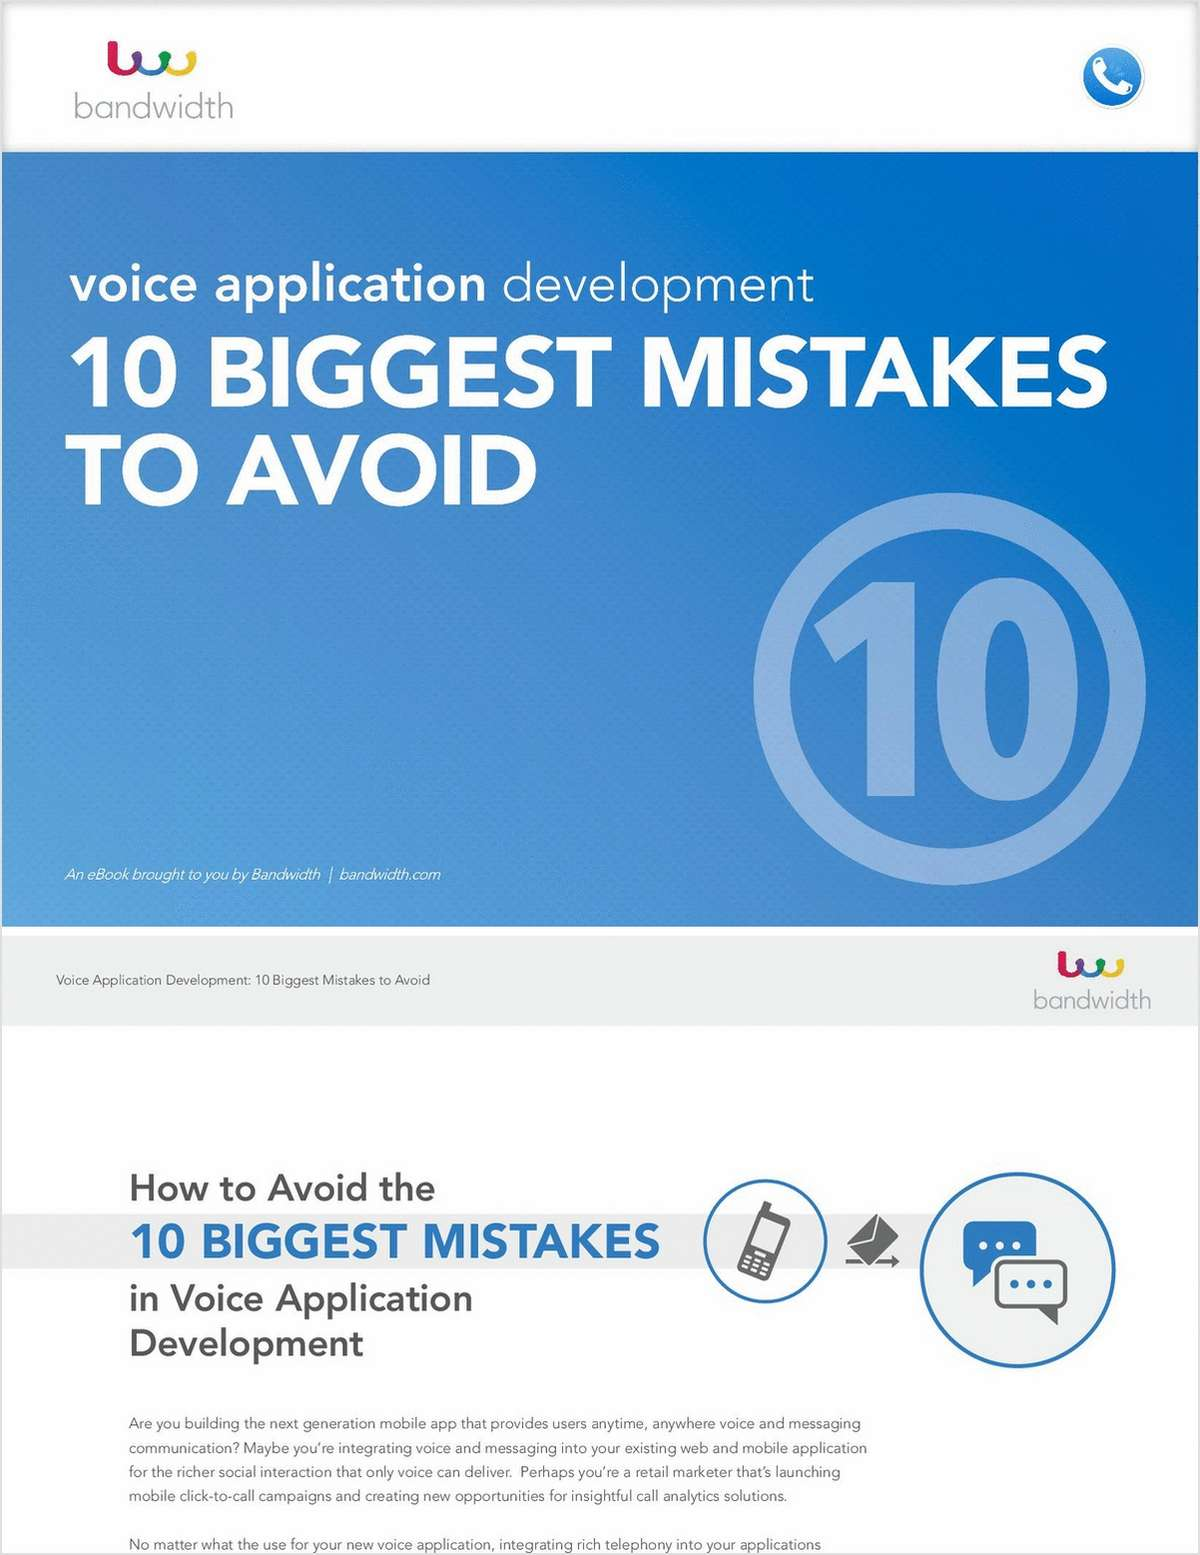 Voice App Development, 10 Biggest Mistakes to Avoid